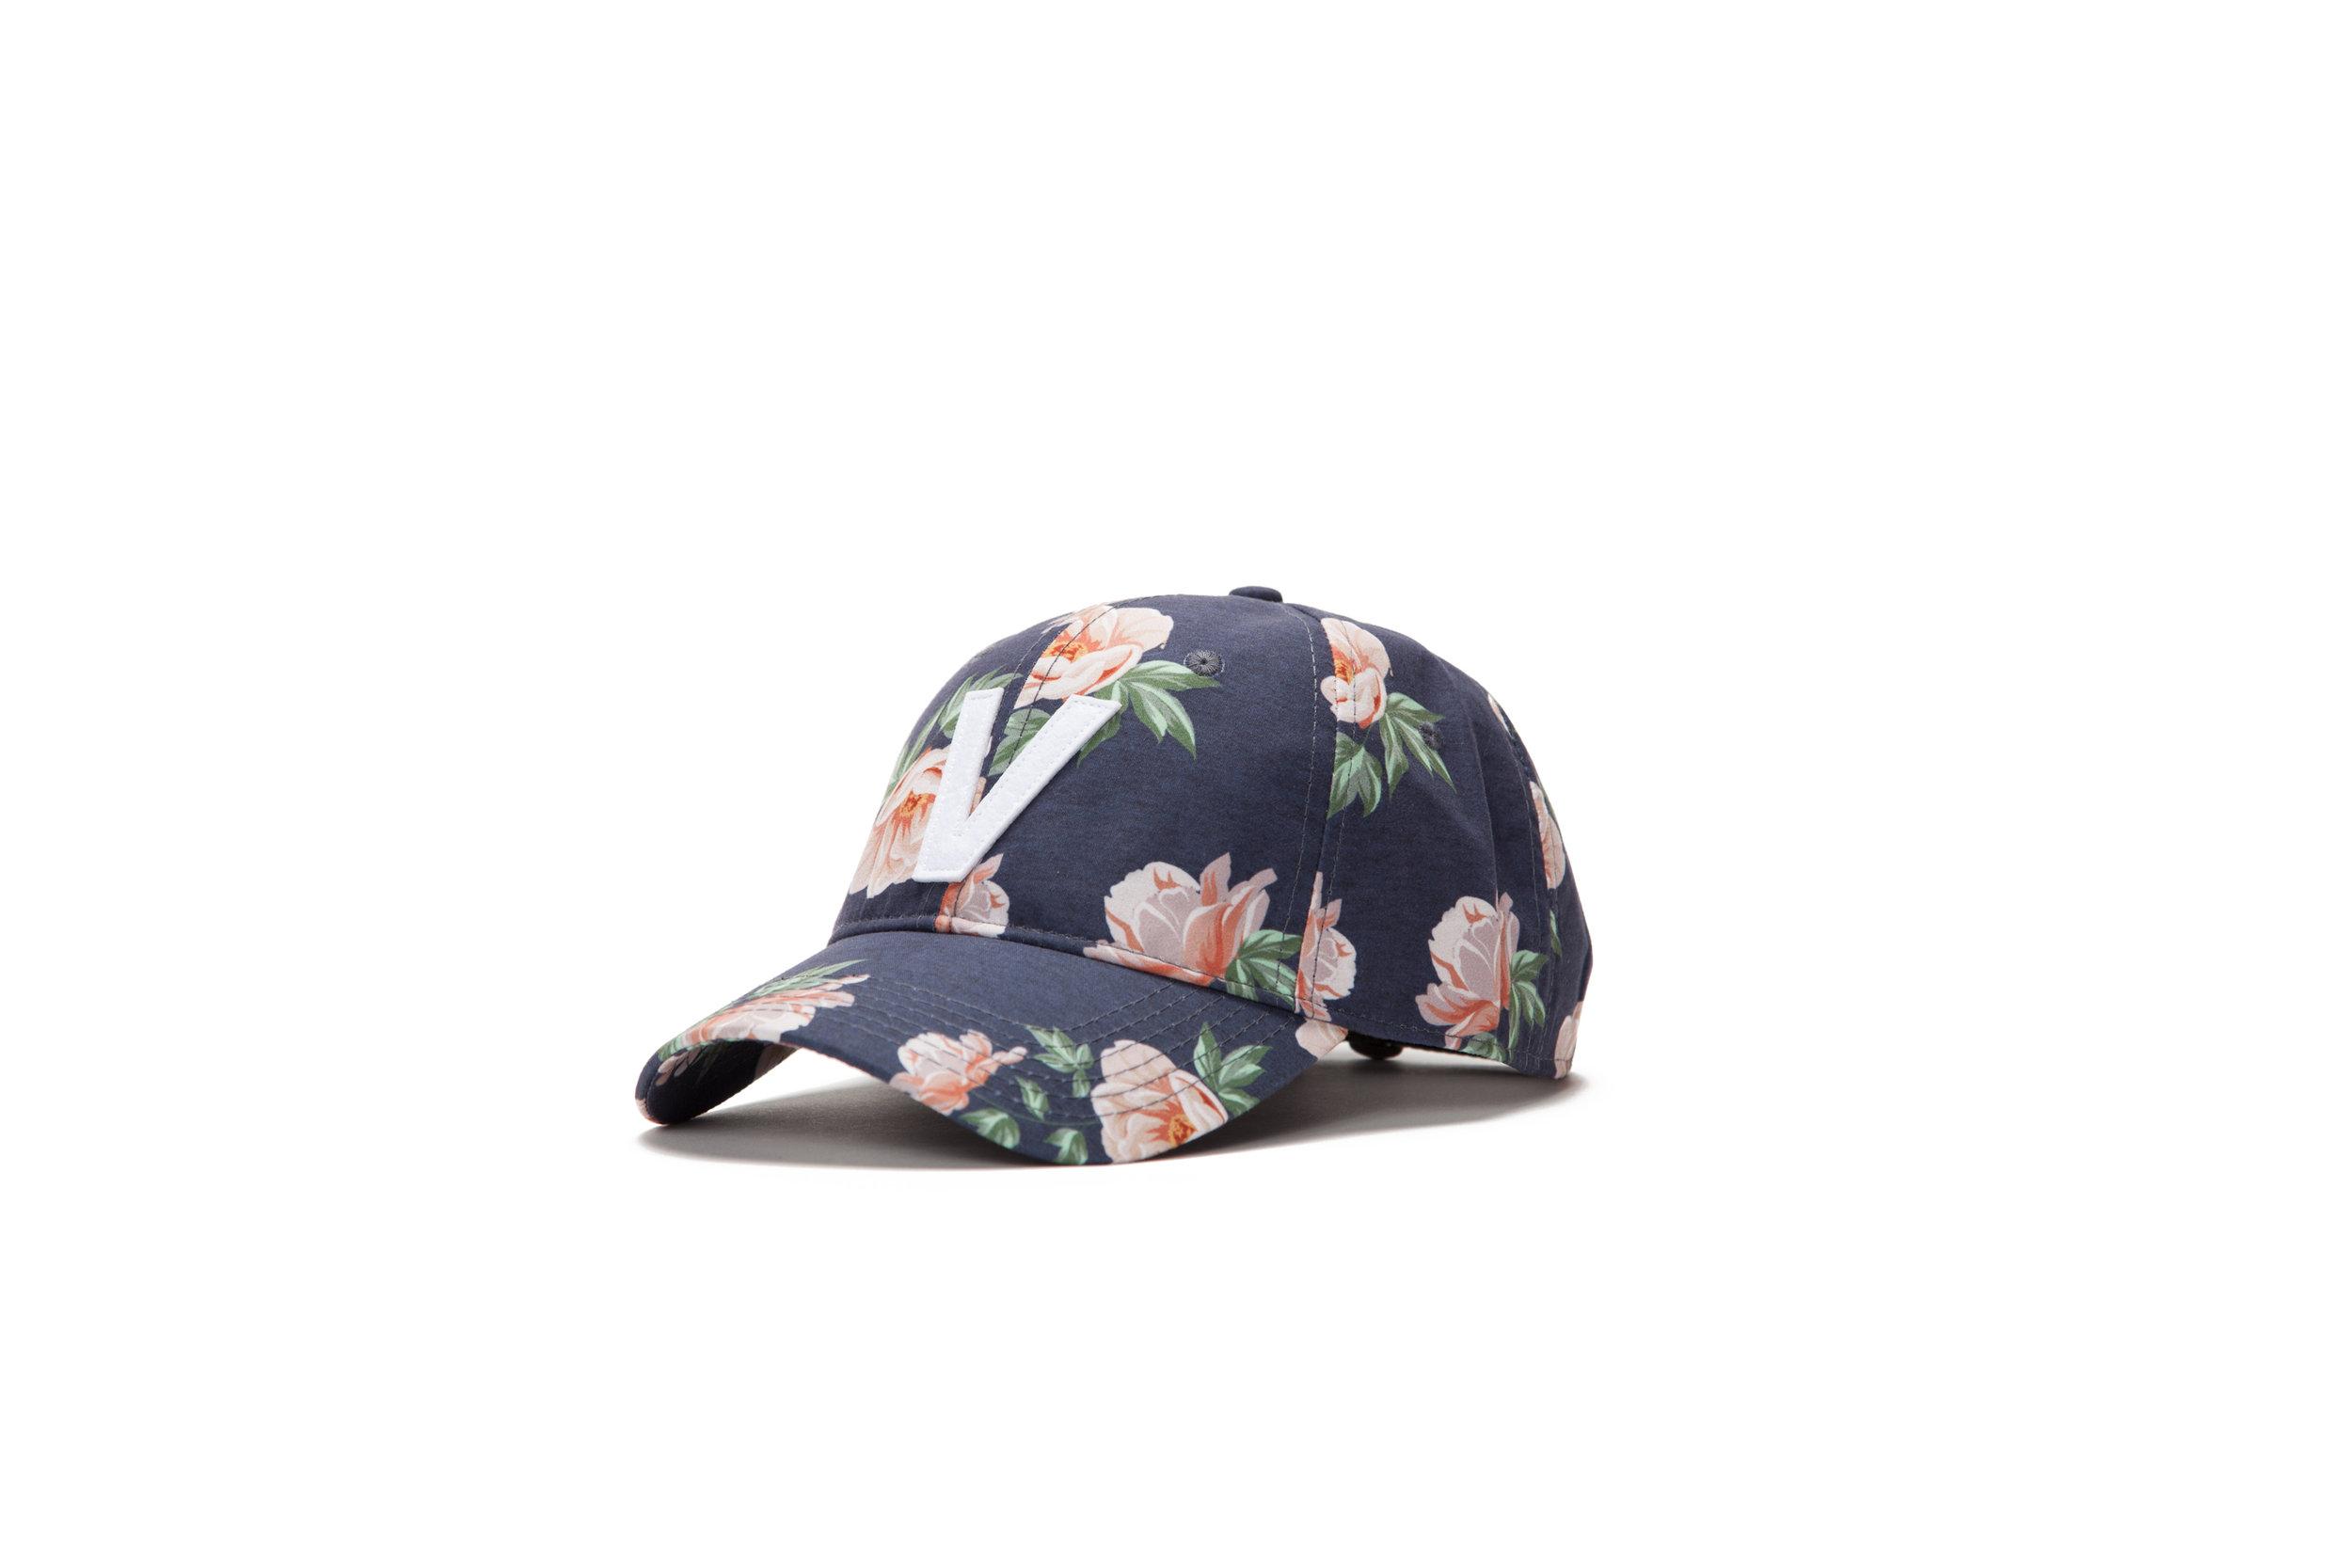 Hat-rose-navy-FRONT.jpg